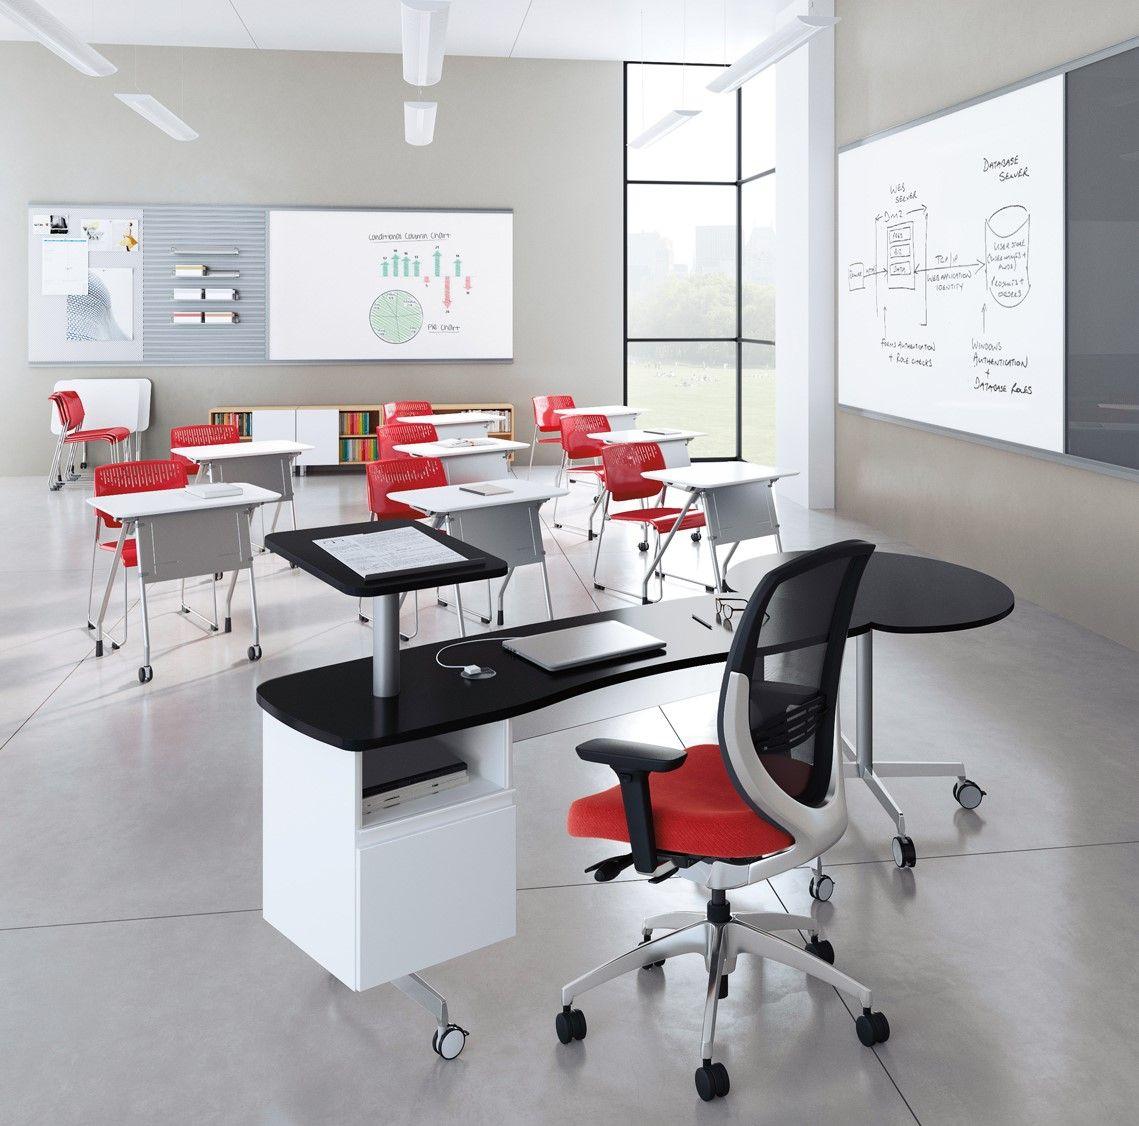 Educational Furniture Supplier Jacksonville FL Furniture